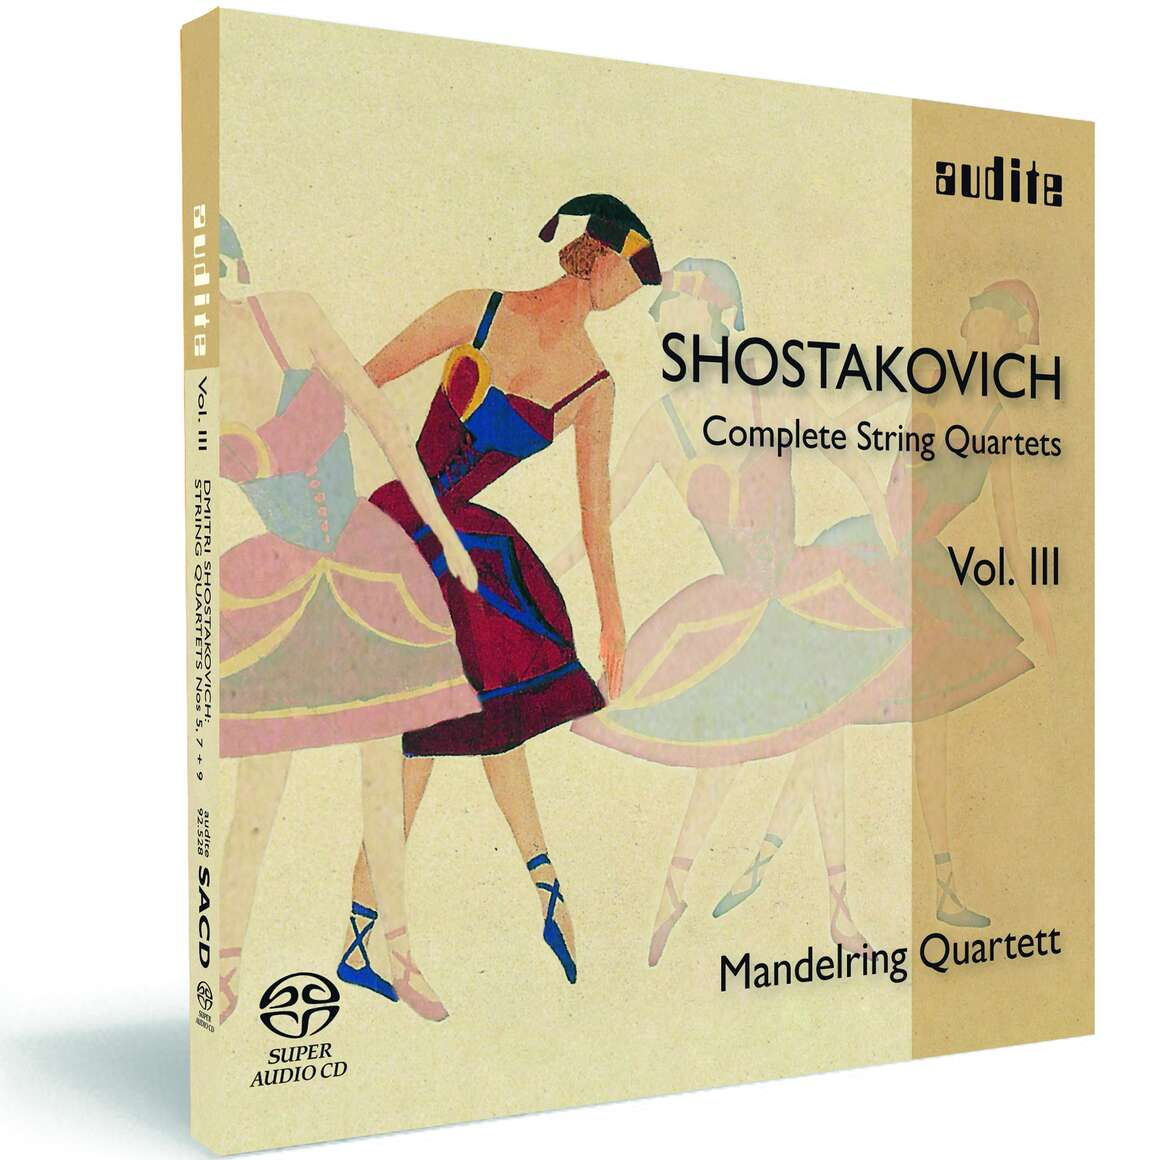 D. Shostakovich: Complete String Quartets Vol. III